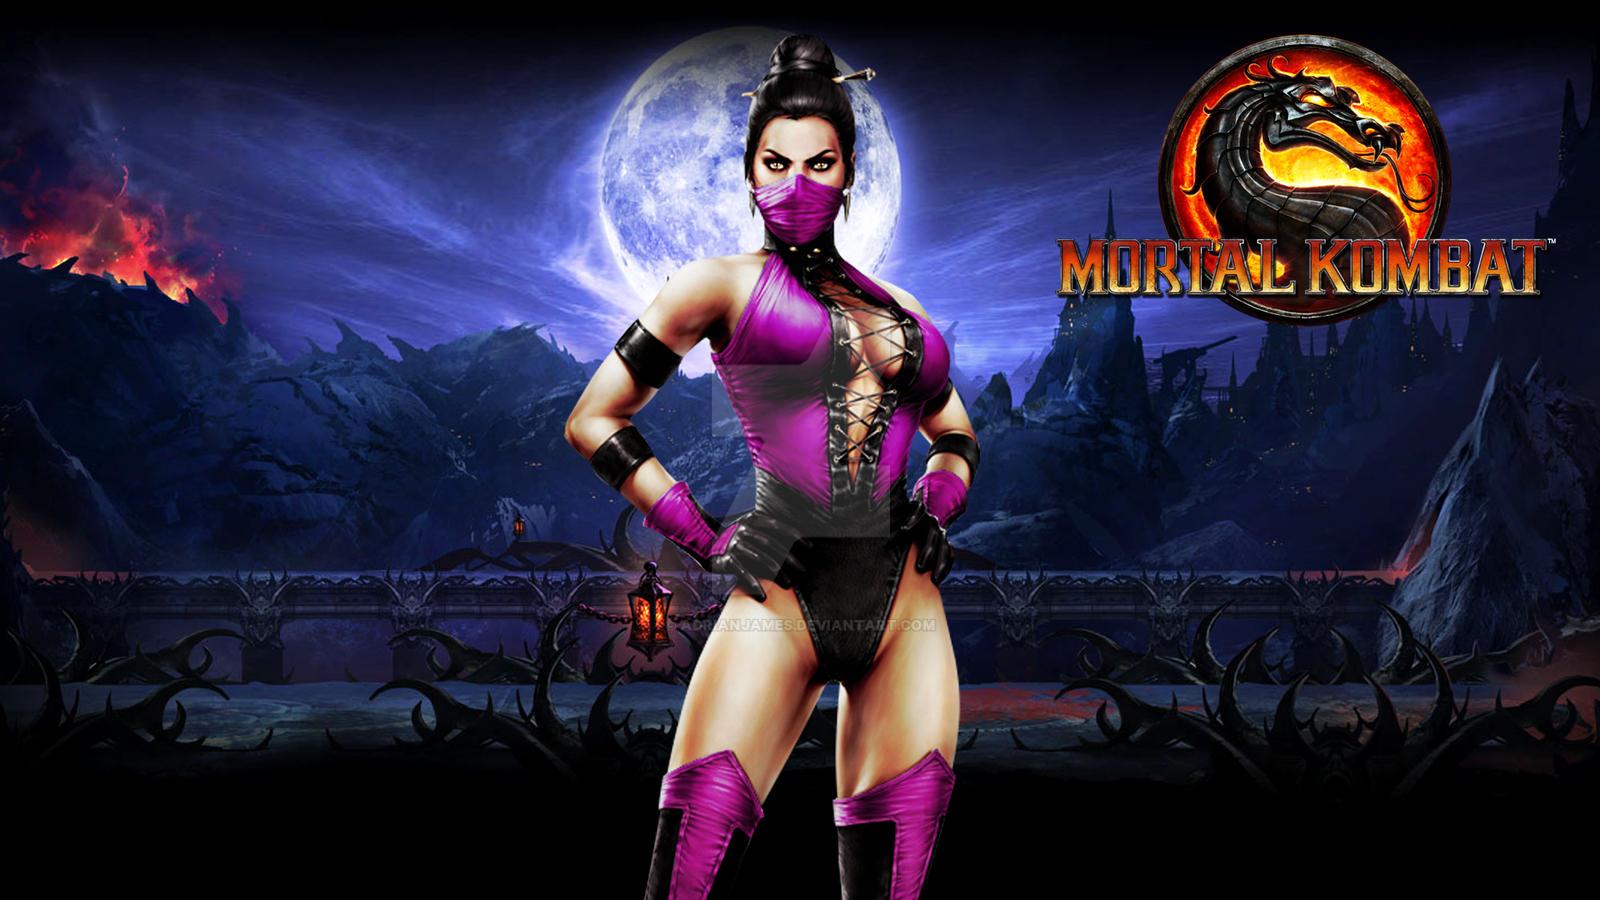 Mortal kombat mileena